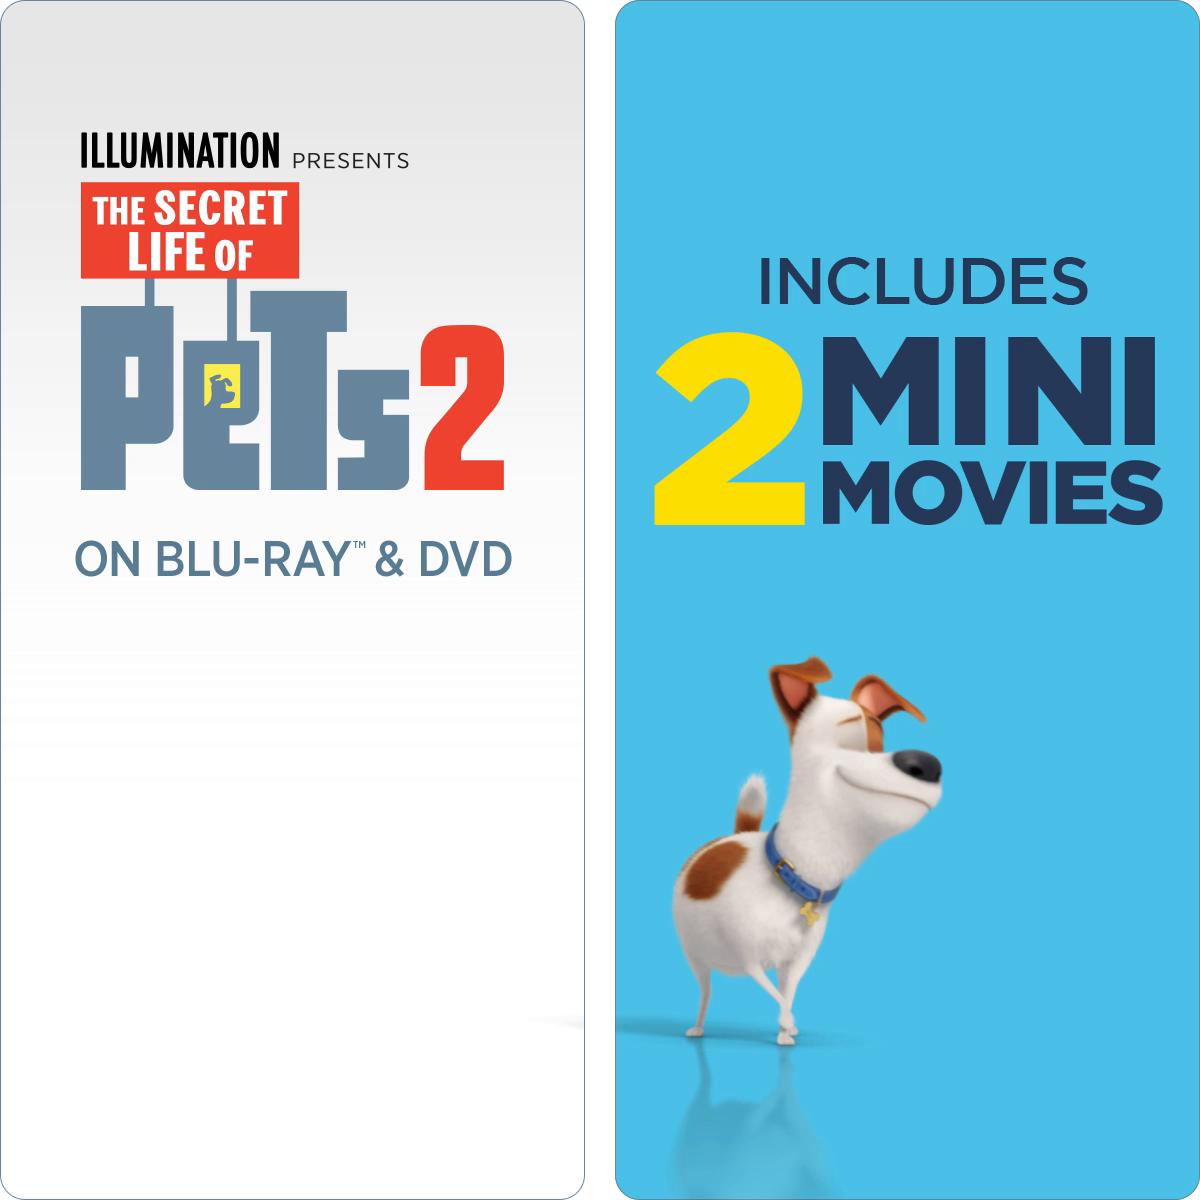 Pin By Carl Green On La Vida Secreta De Tus Mascotas Video In 2020 Secret Life Secret Life Of Pets Movies By Genre